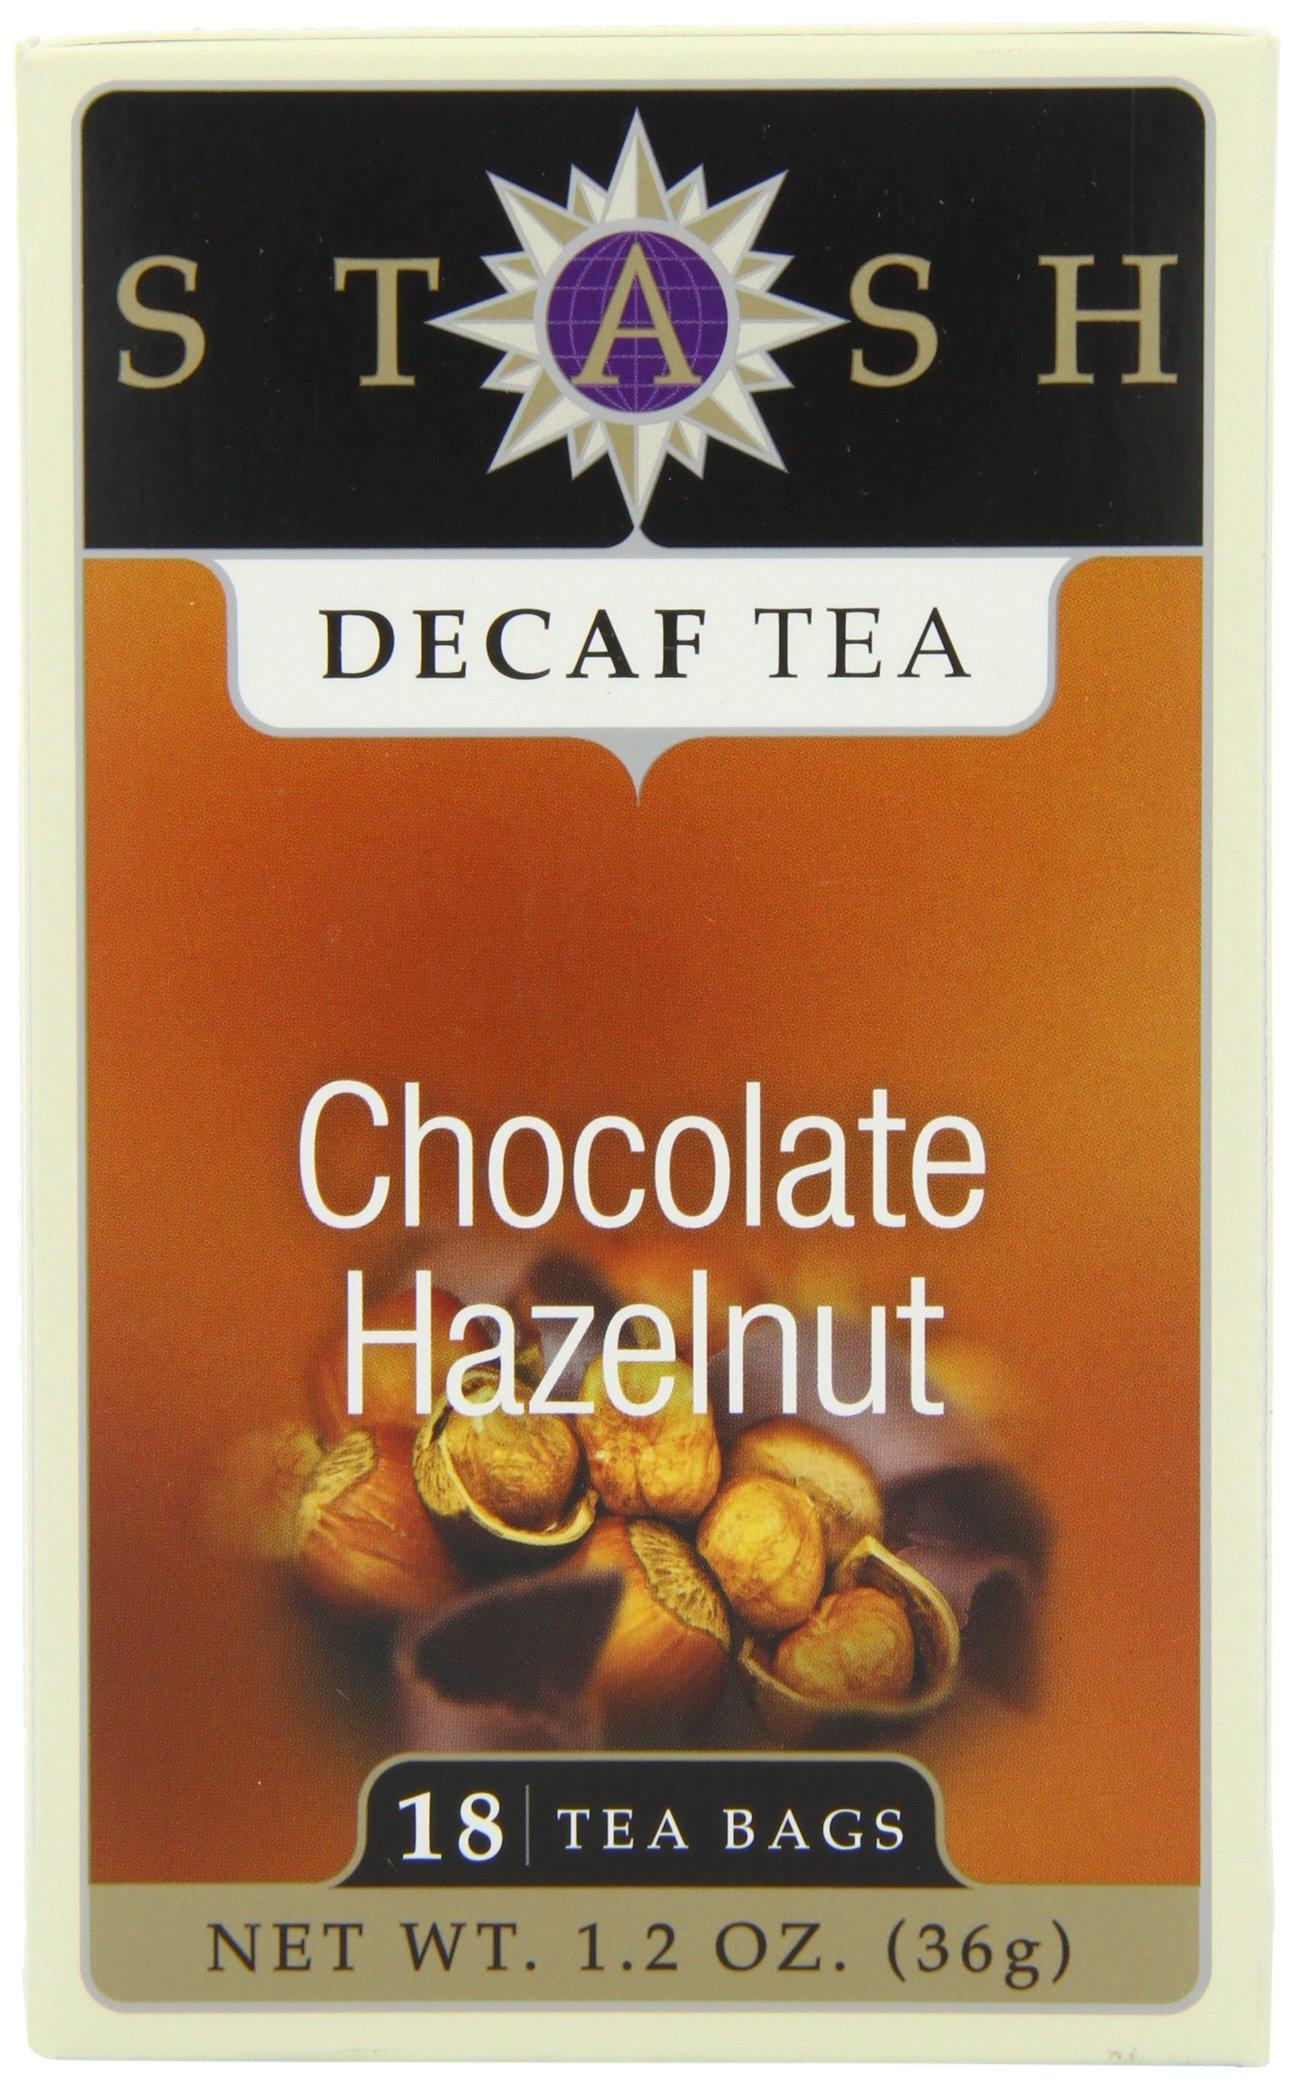 Stash Tea Decaf Chocolate Hazelnut Tea, 18 Count Tea Bags in Foil (Pack of 6)